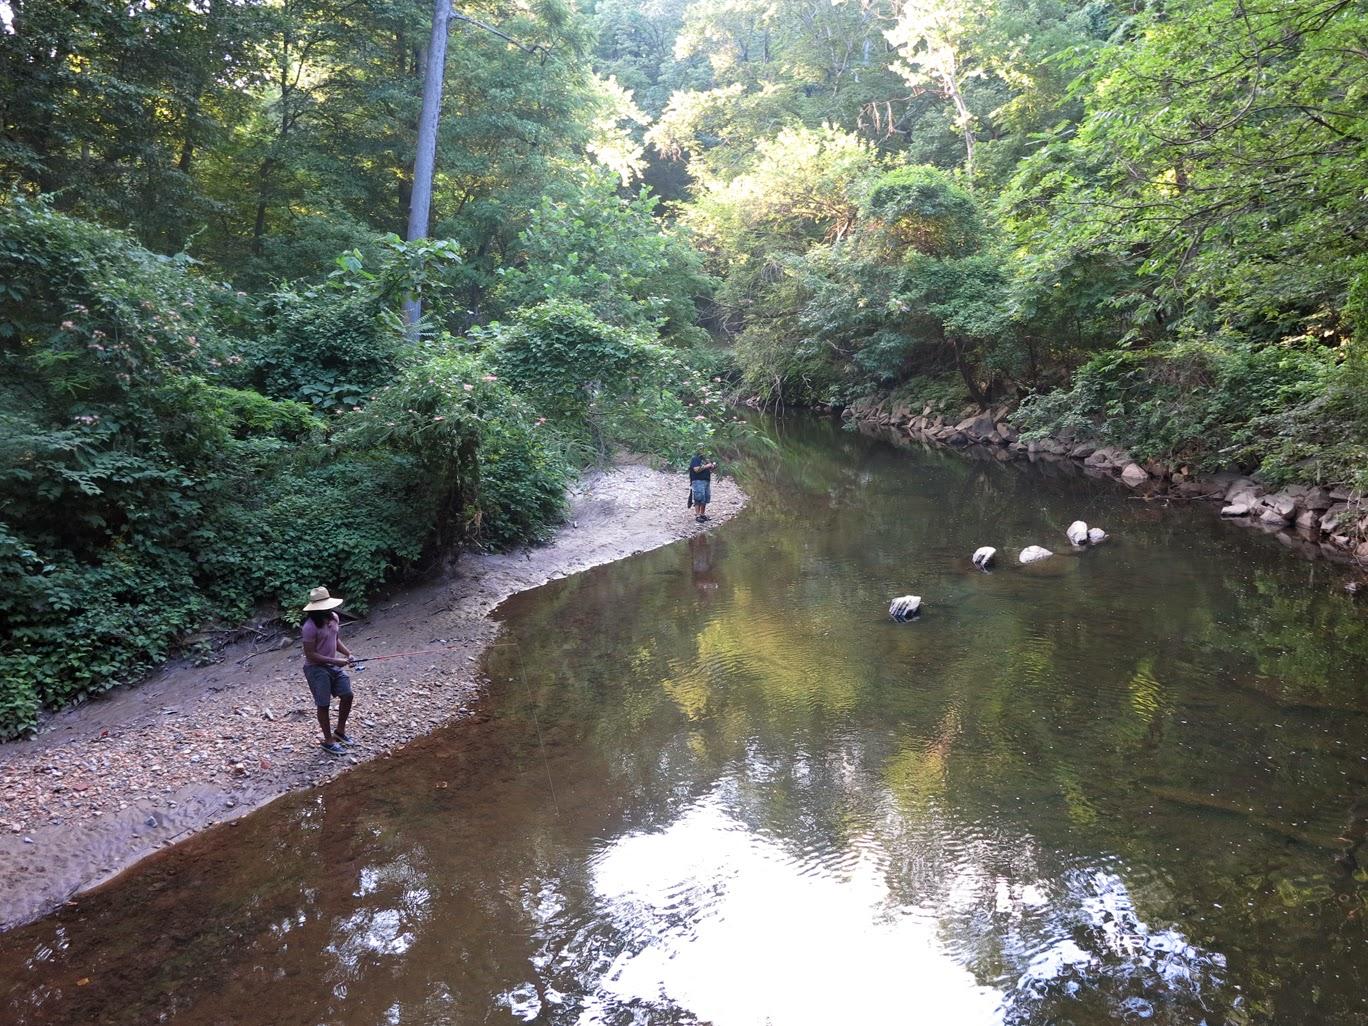 gwadzilla rock creek park a national park and the backyard to